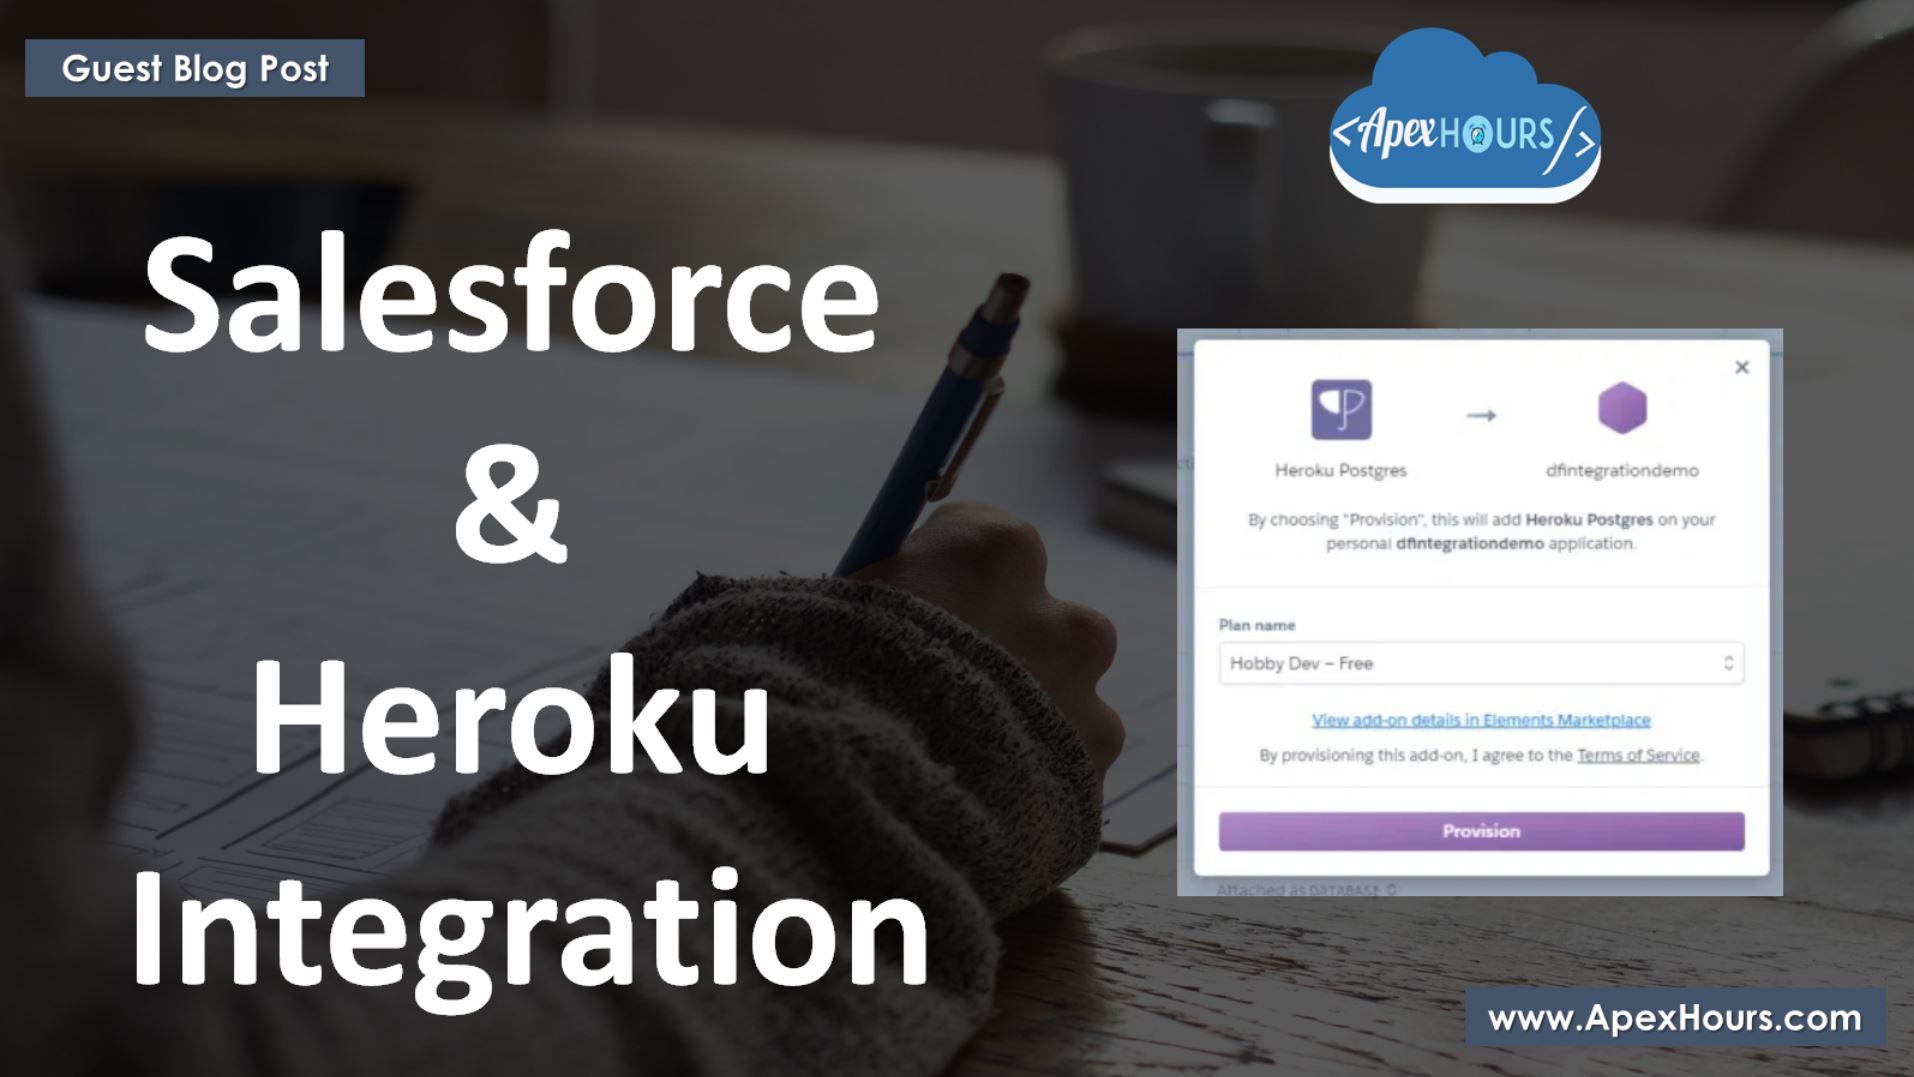 Salesforce and Heroku Integration